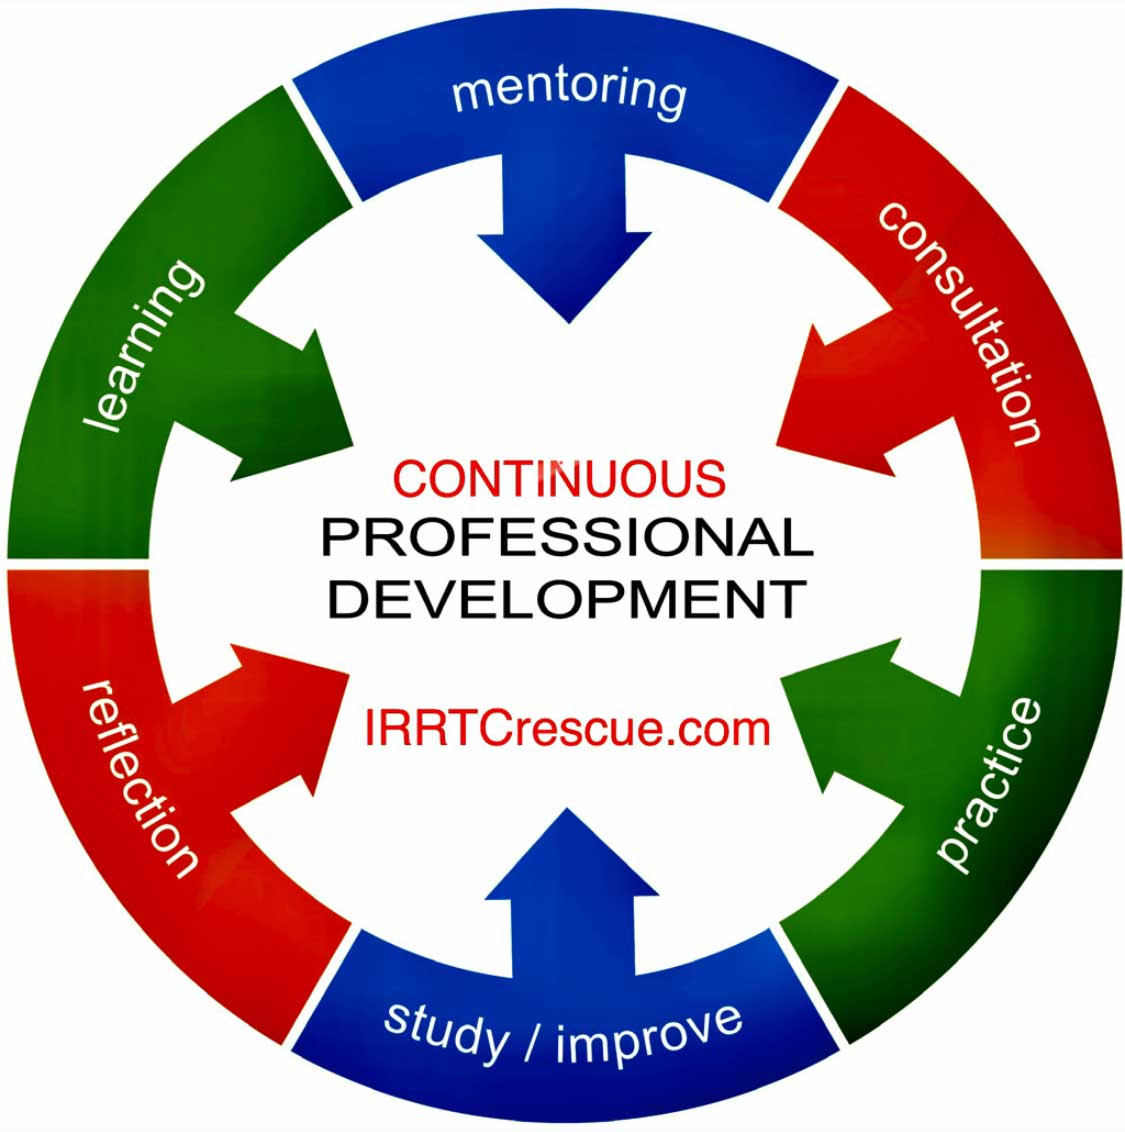 IRRTC continuous Professional Development circle